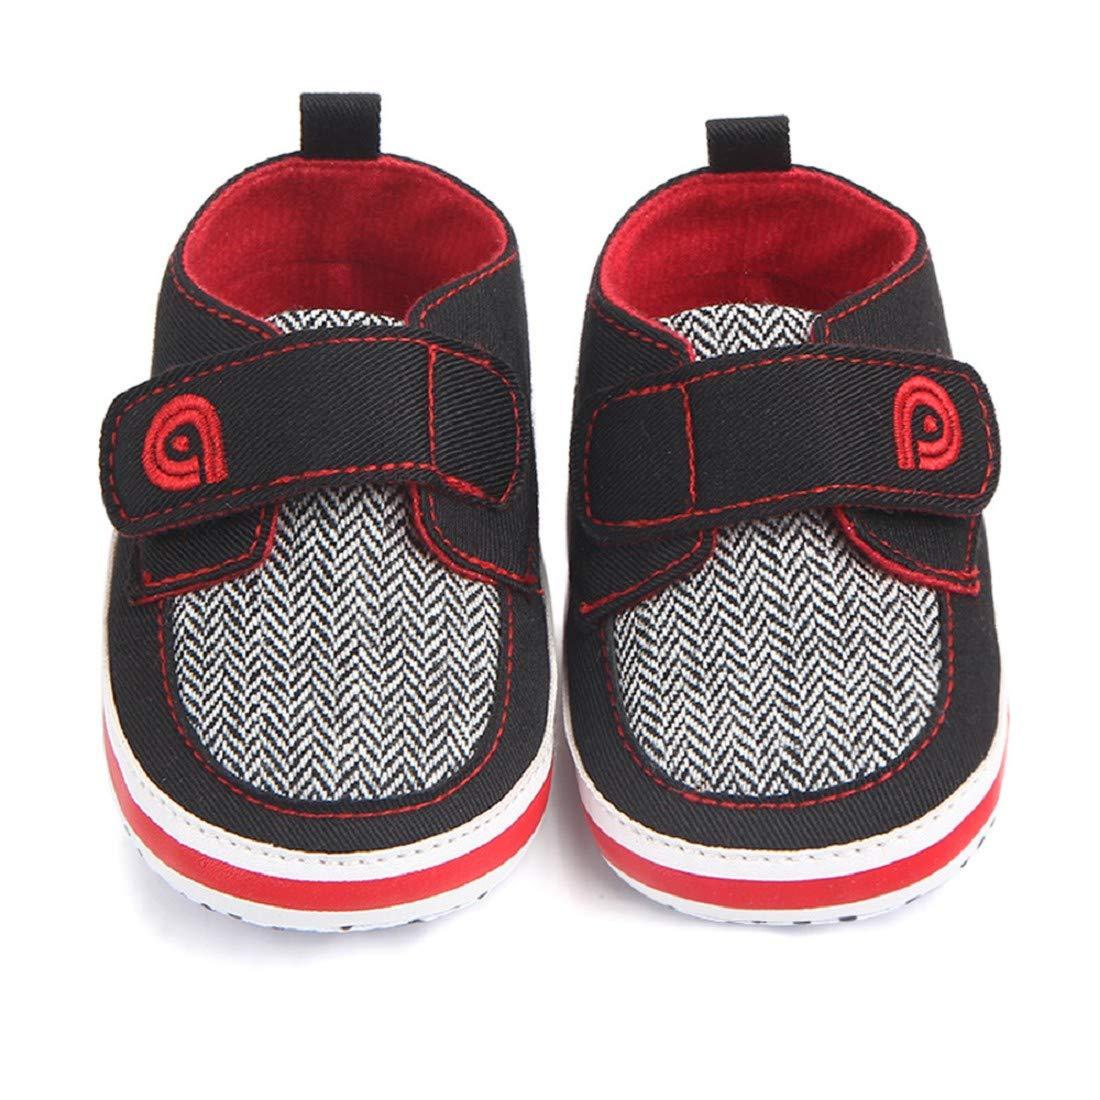 Canvas Shoes FAPIZI Newborn Infant Baby Girl Boy Print Crib Shoes Soft Sole Anti-Slip Sneakers